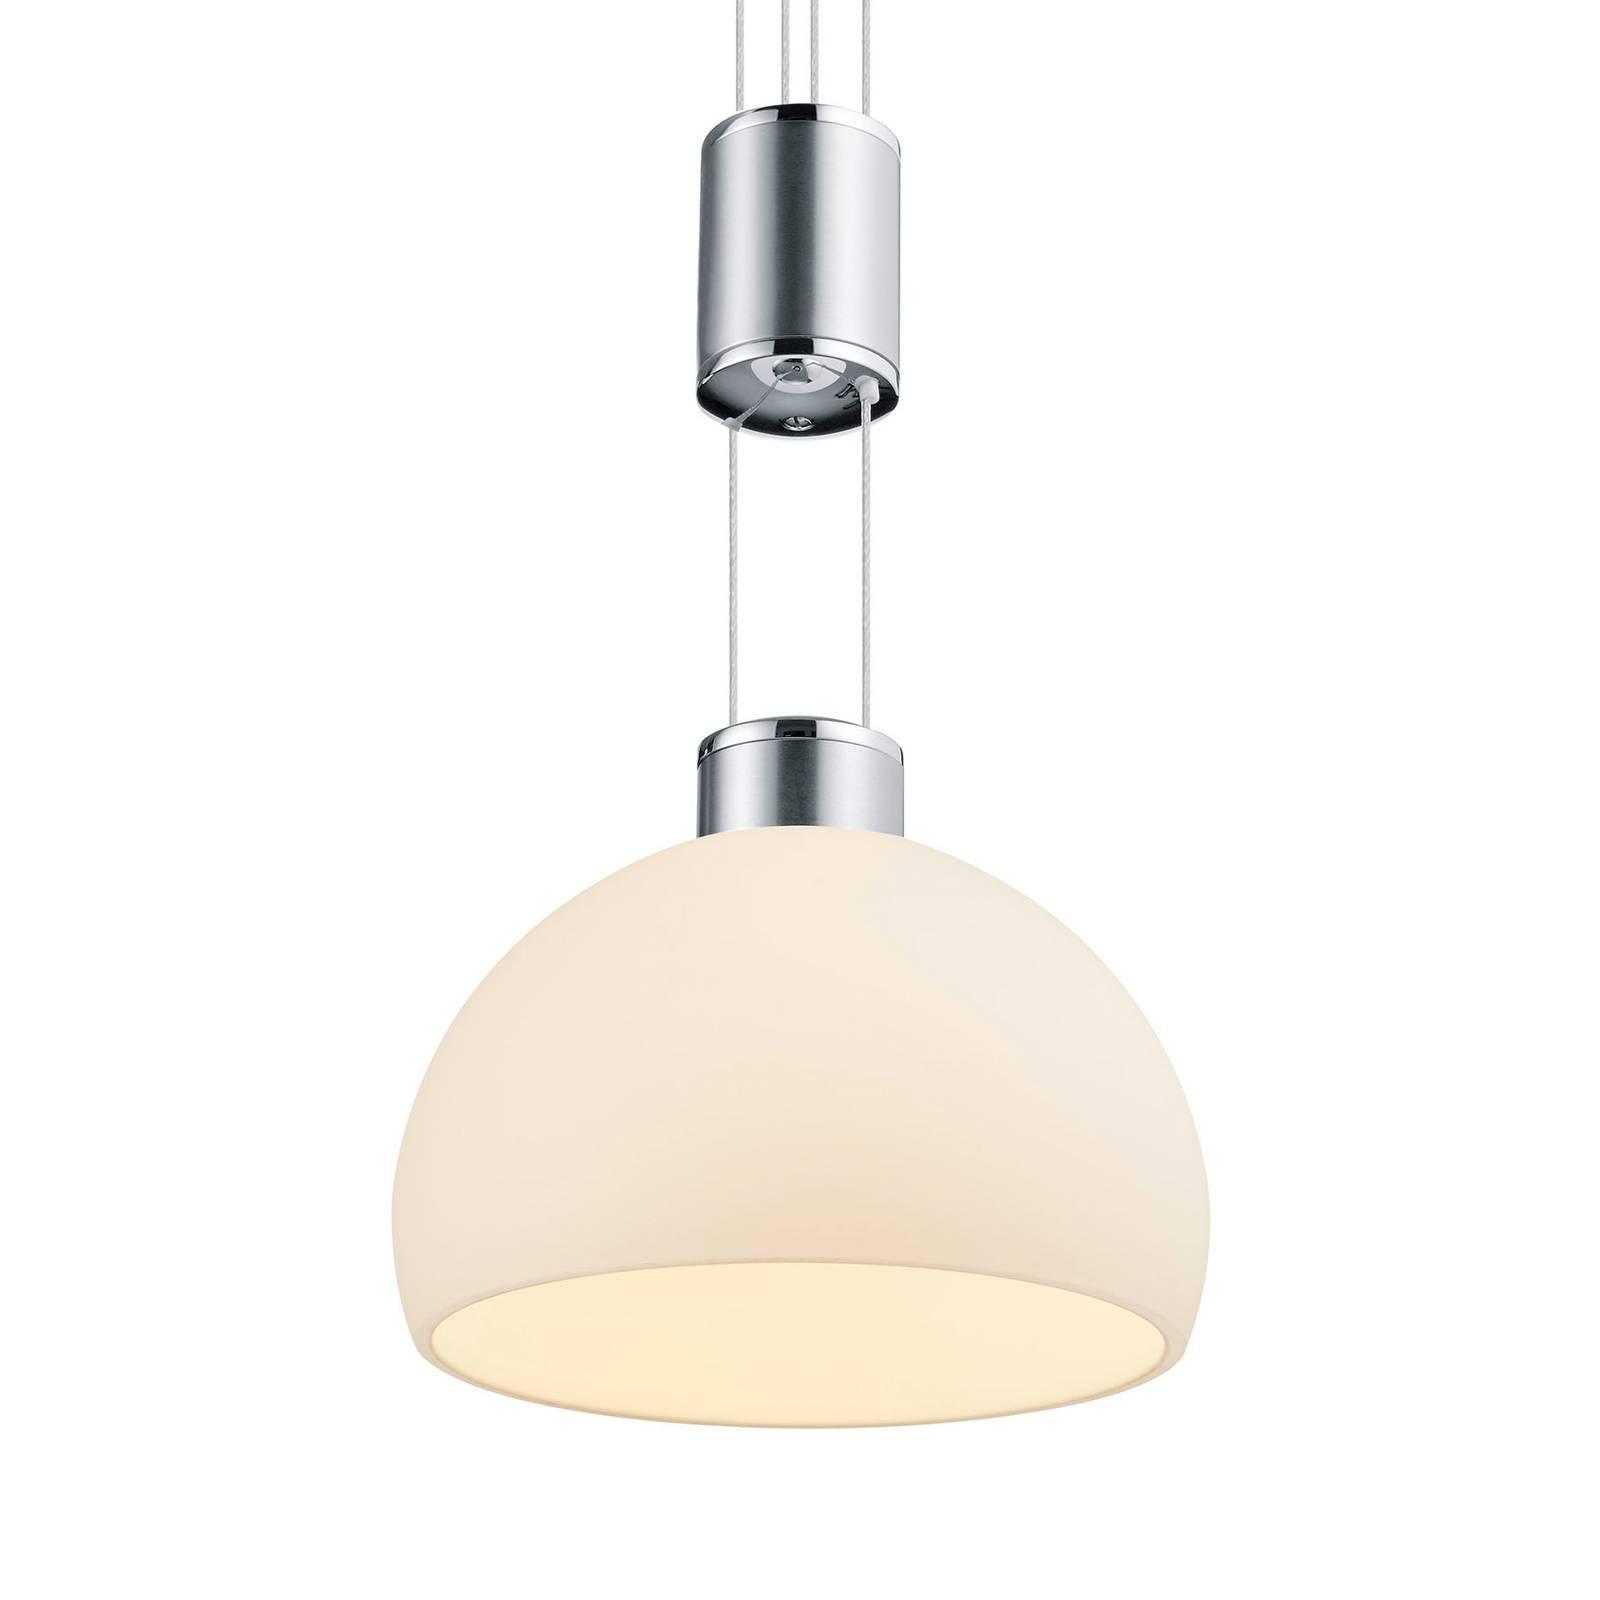 BANKAMP Meesterwerk hanglamp 3-lamps nikkel